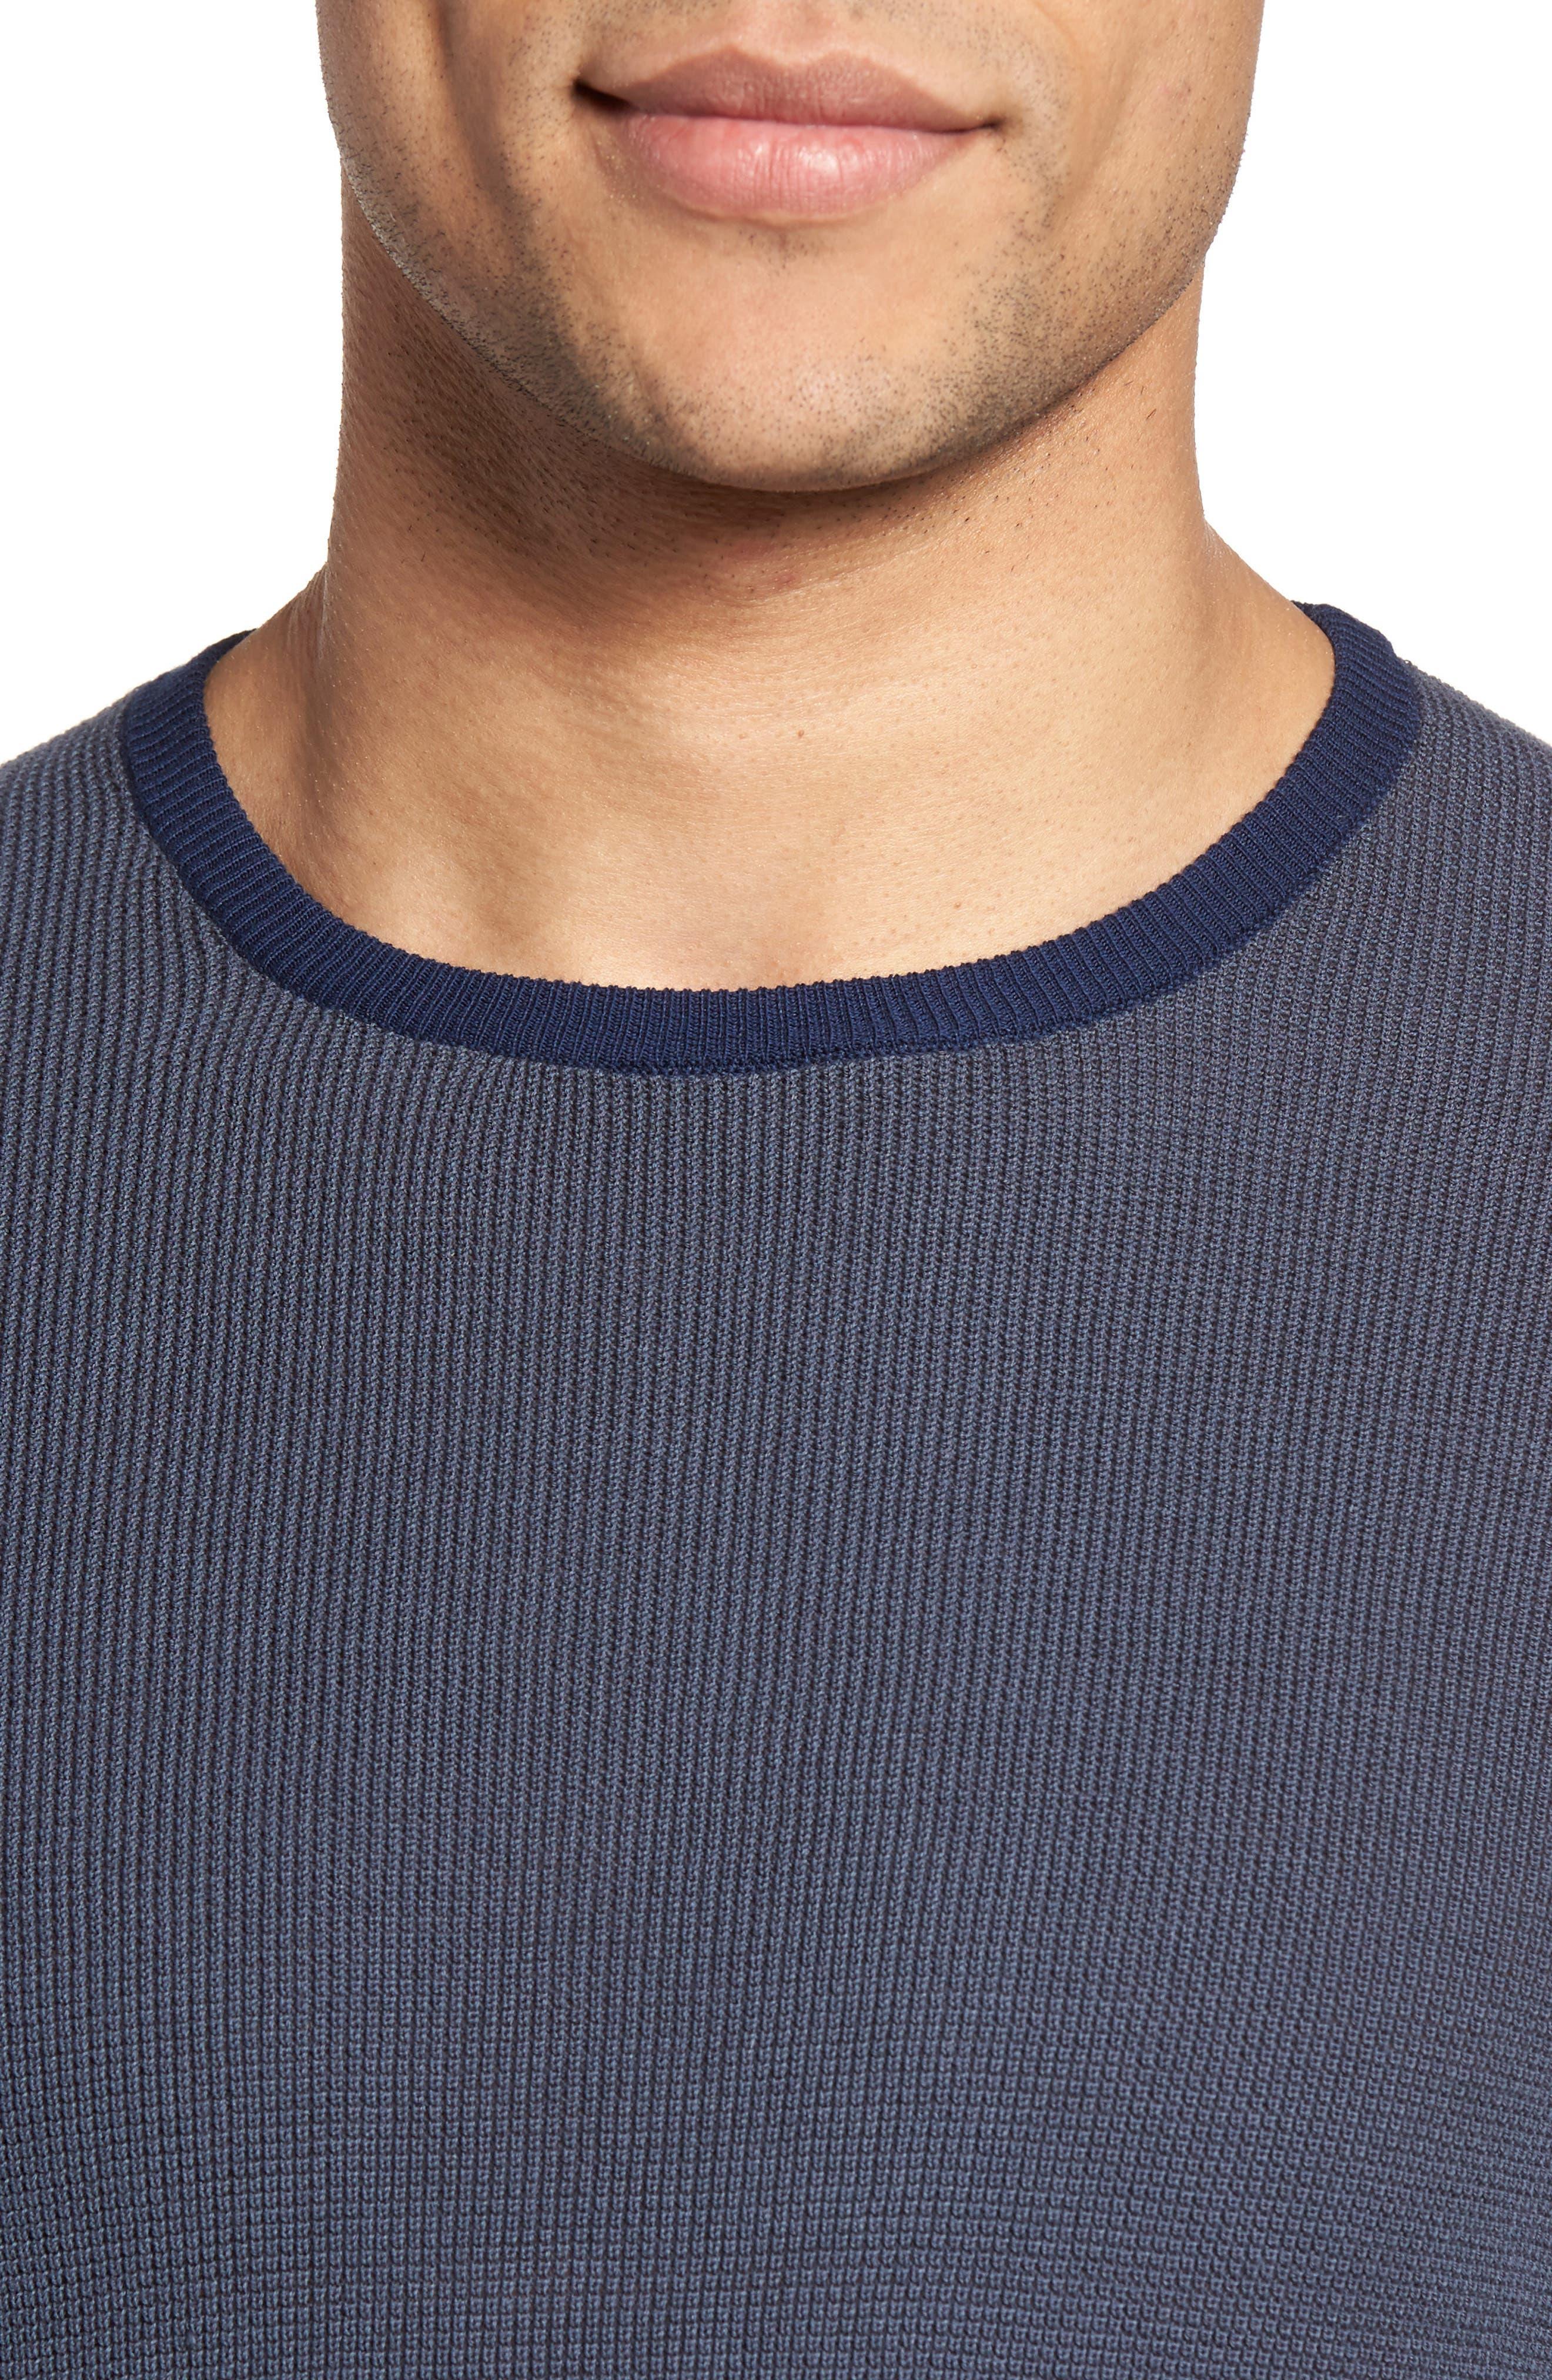 Boxwood Sweater,                             Alternate thumbnail 8, color,